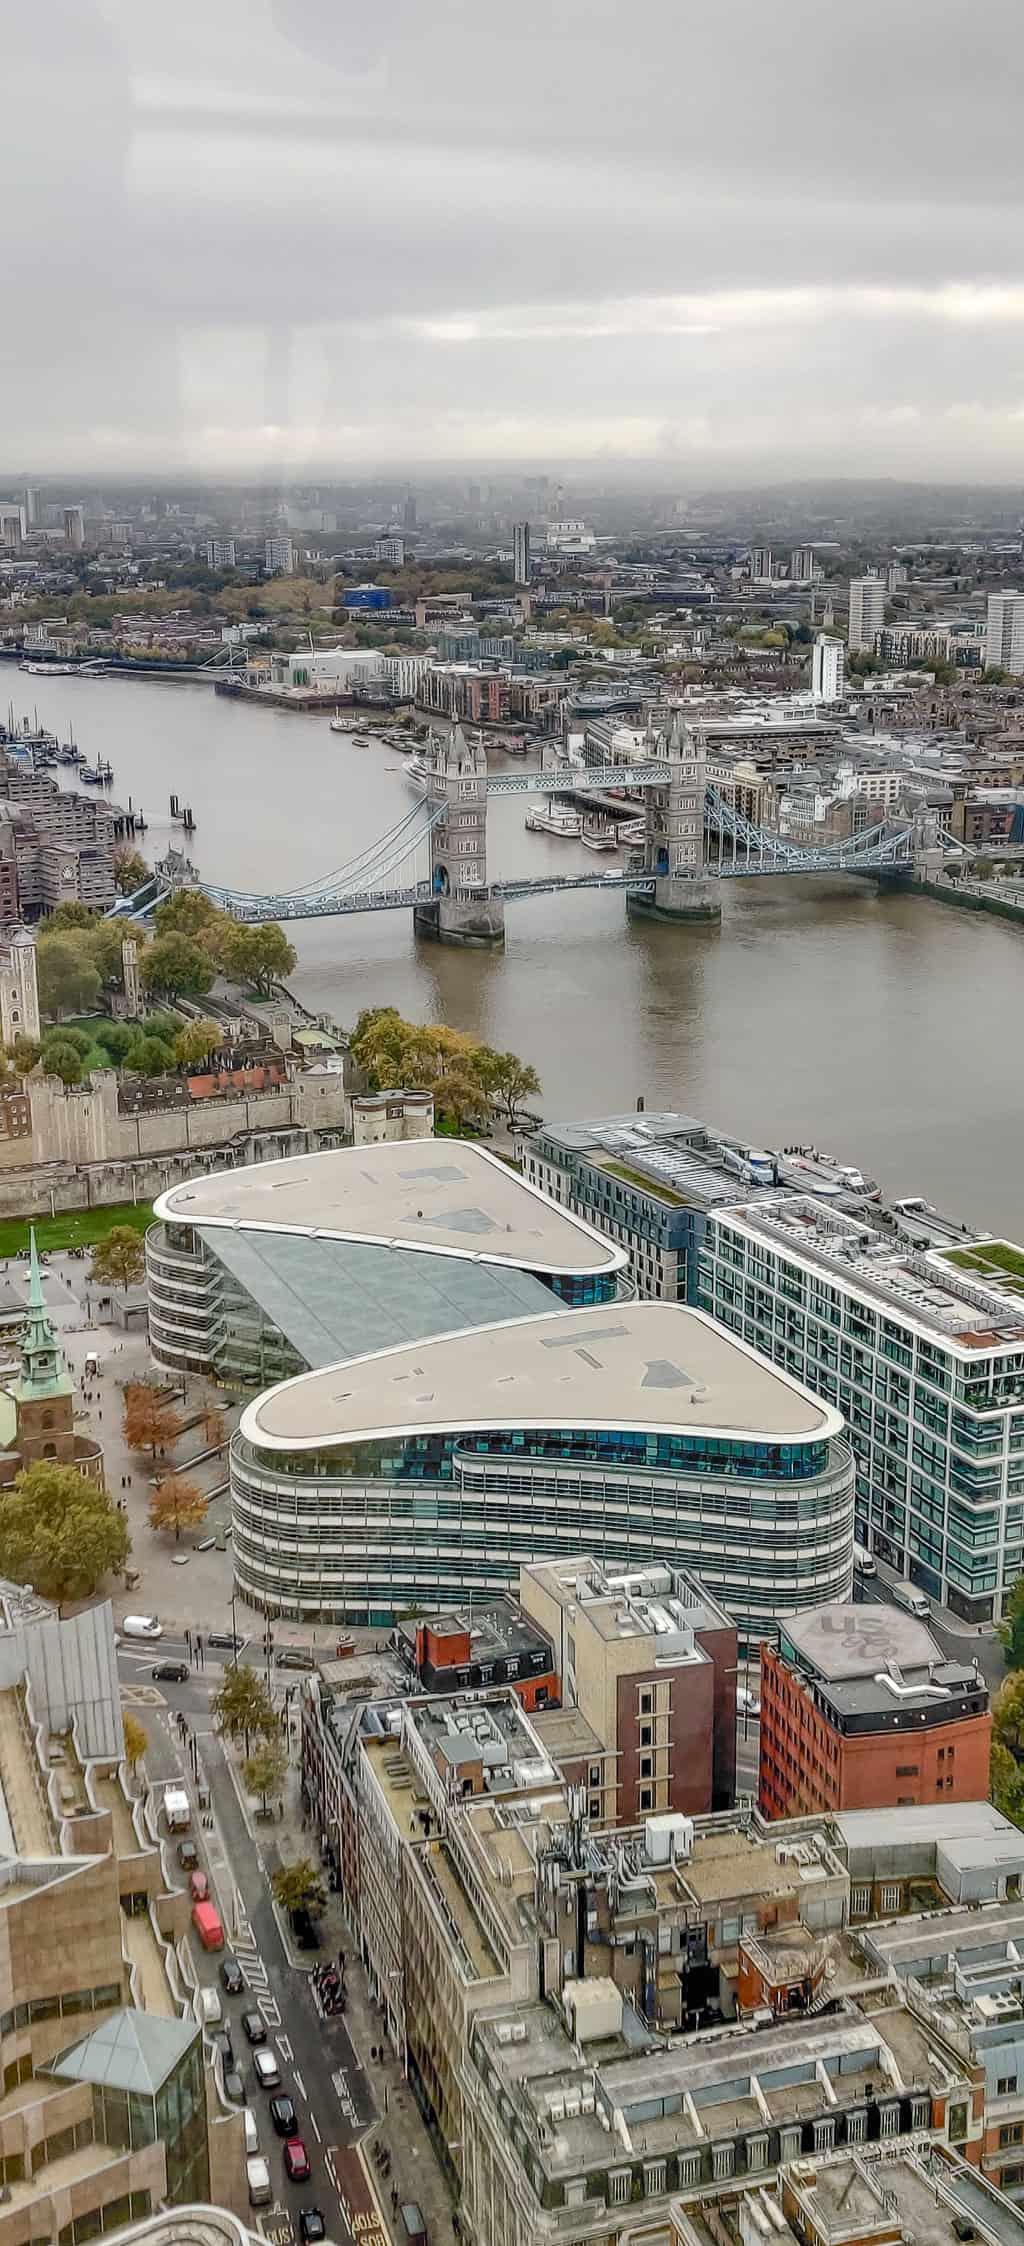 Sky Garden is one of the best views in London